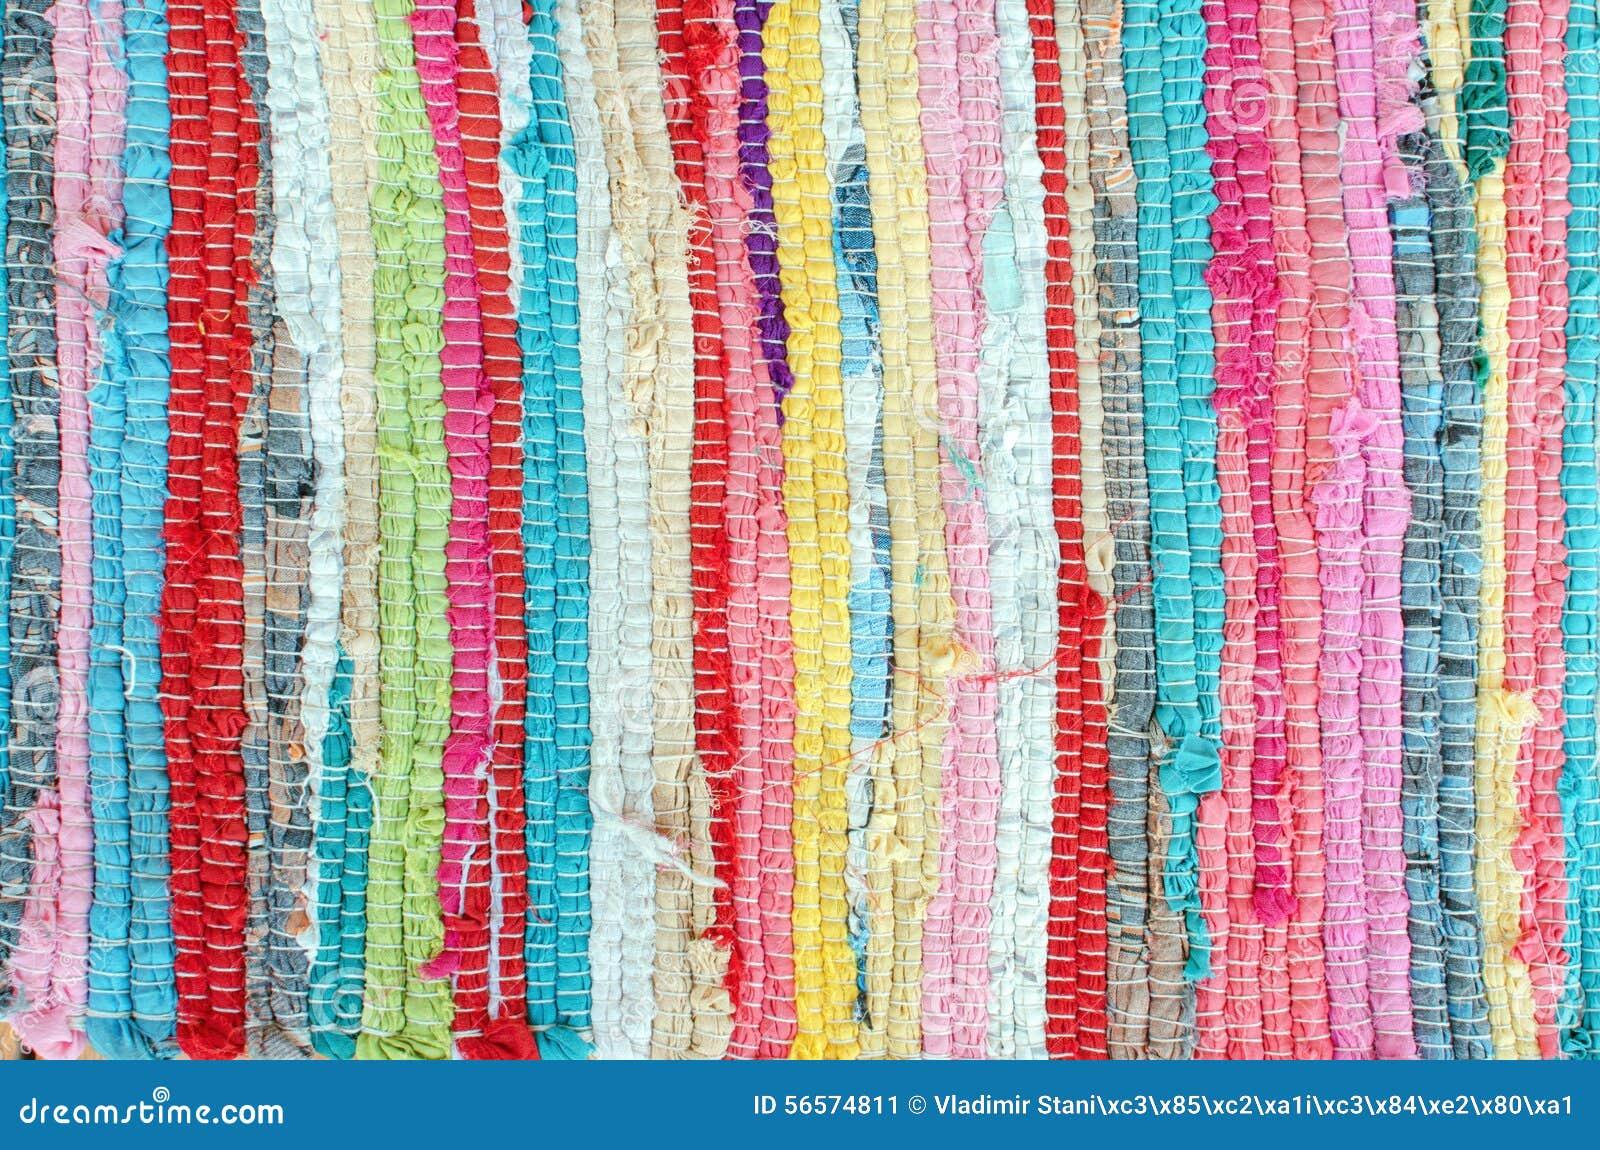 Colorful Carpet Texture Vidalondon